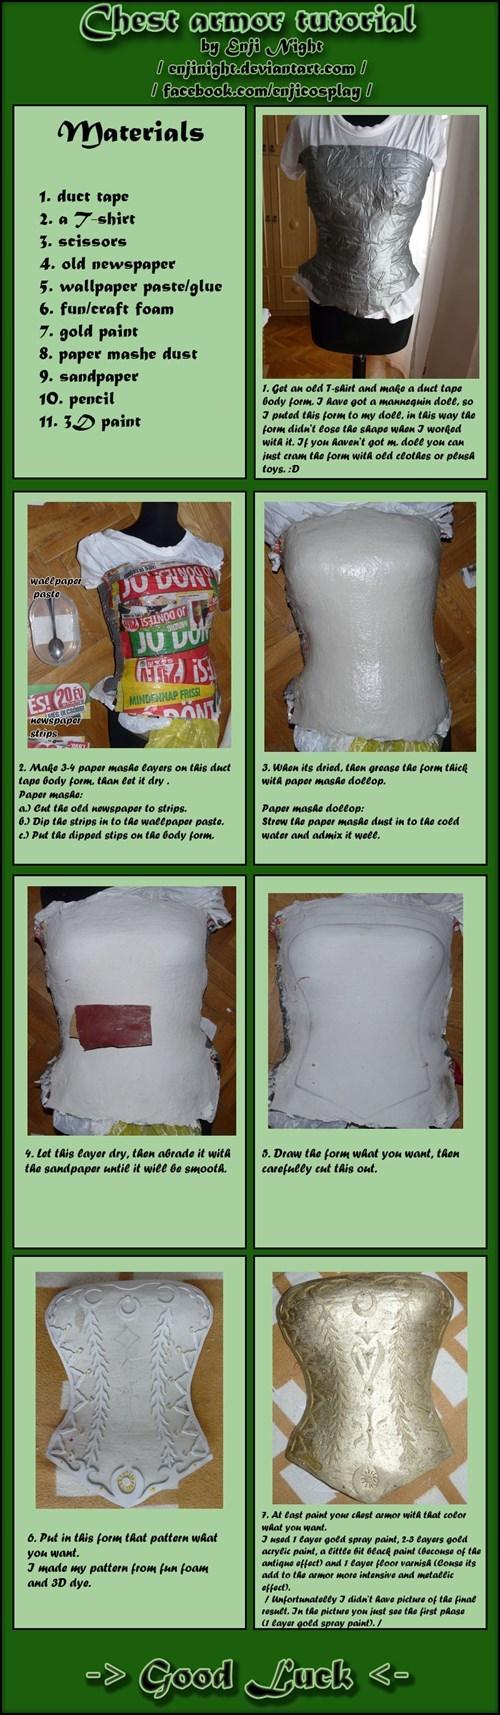 cosplay DIY - 8020551680